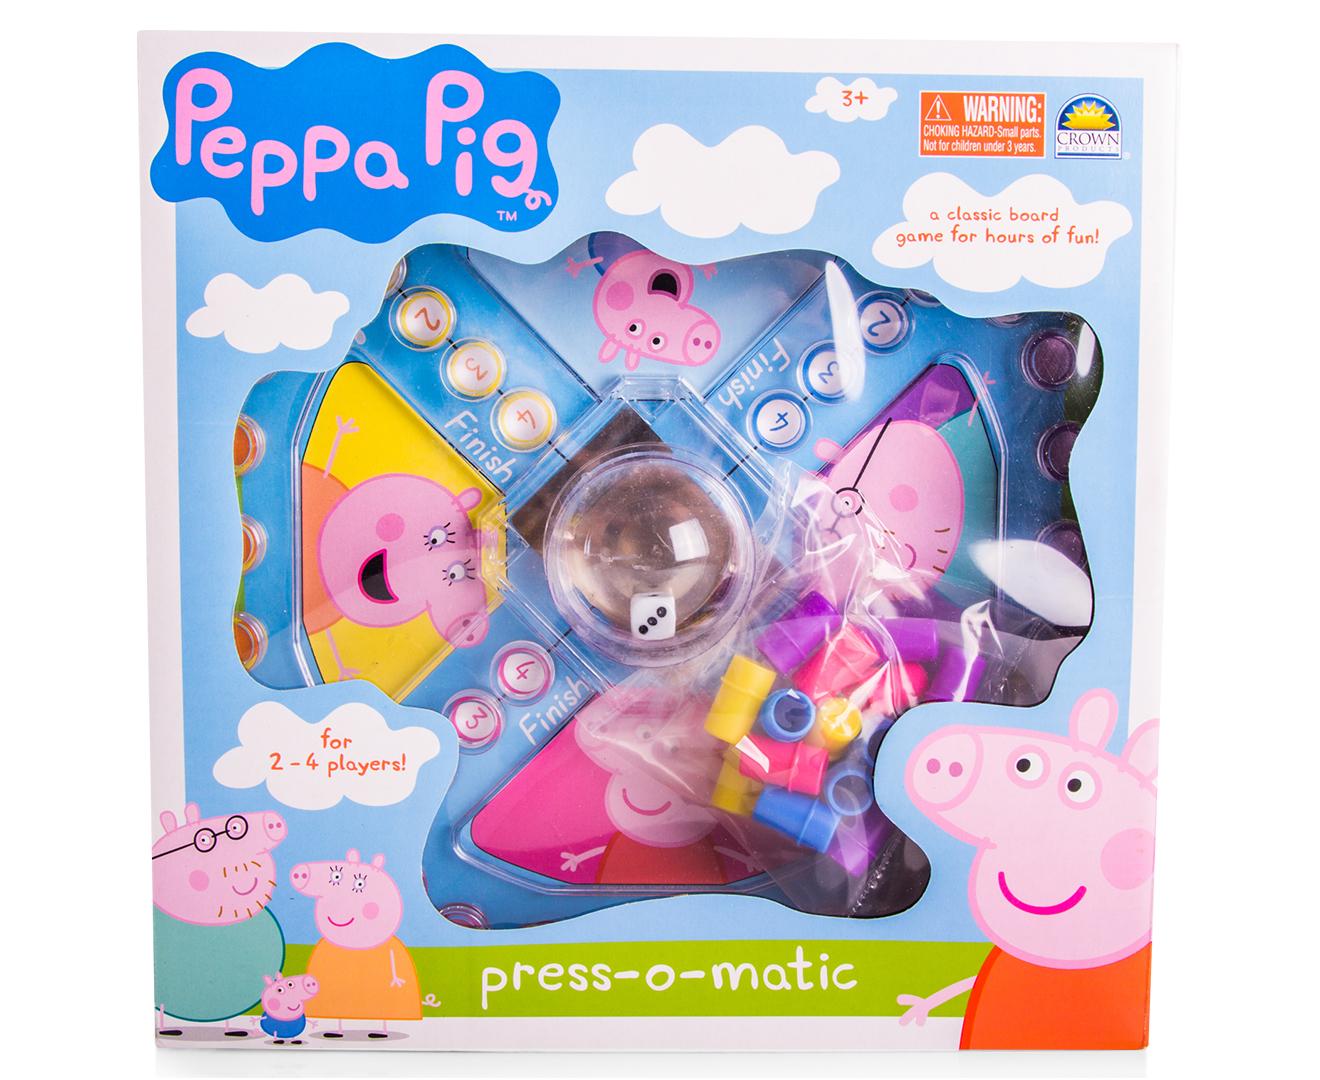 Catchoftheday Com Au Peppa Pig Press O Matic Board Game